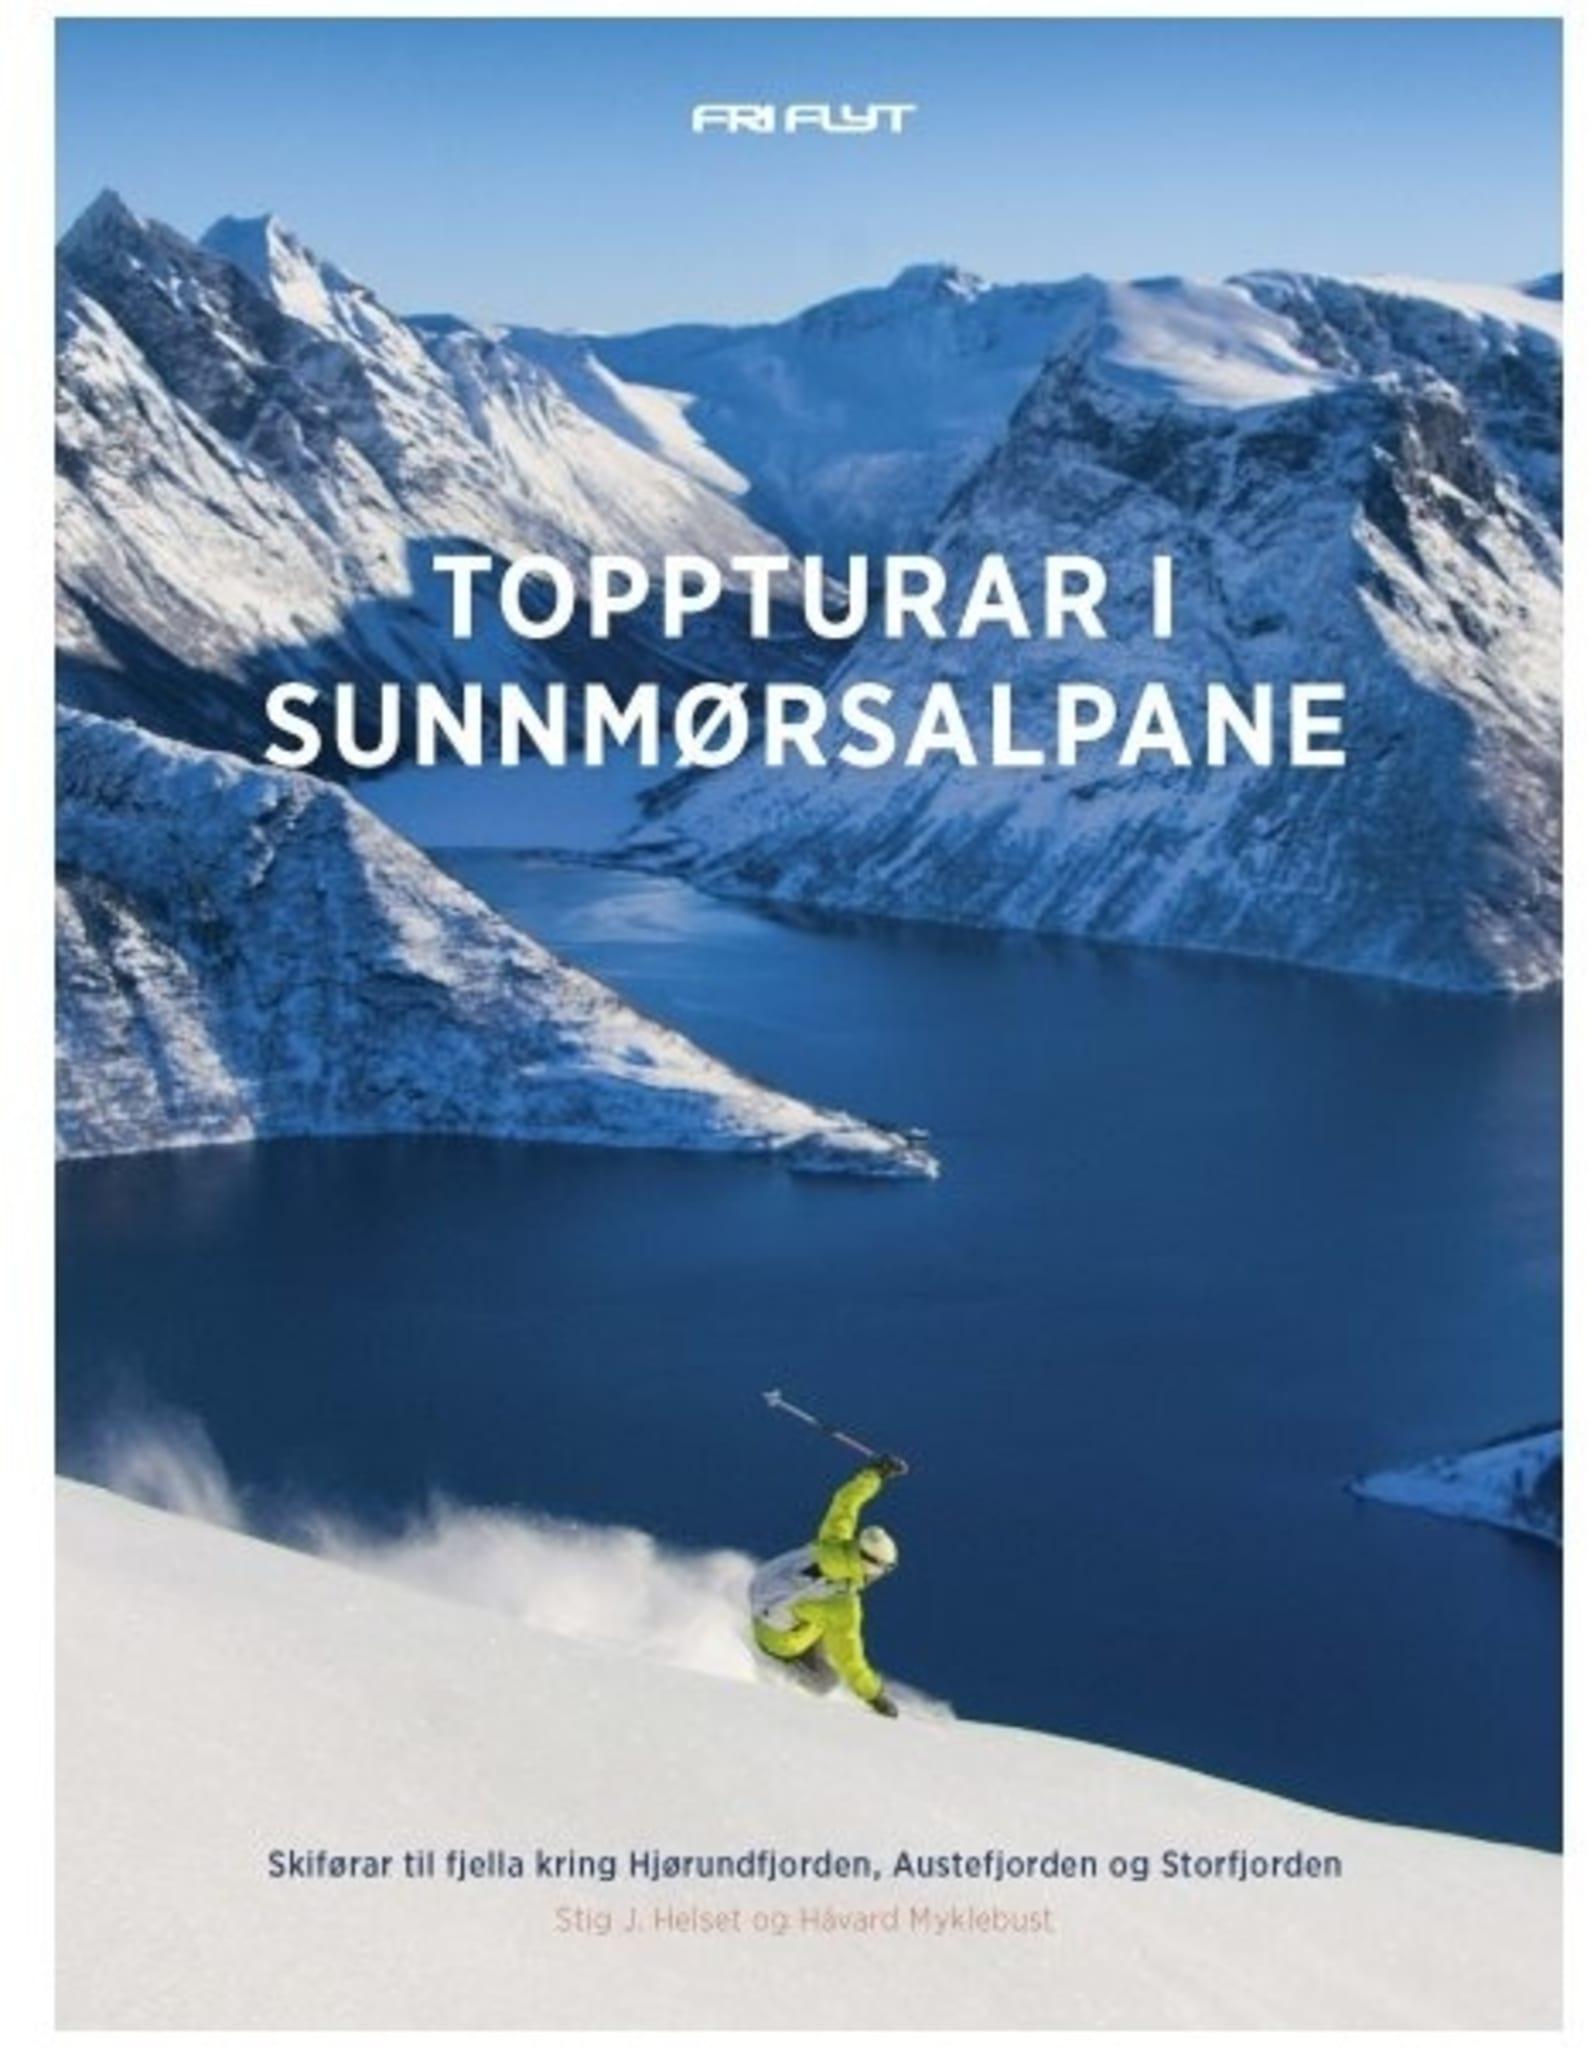 Hjørundfjorden, Austefjorden, Storfjorden